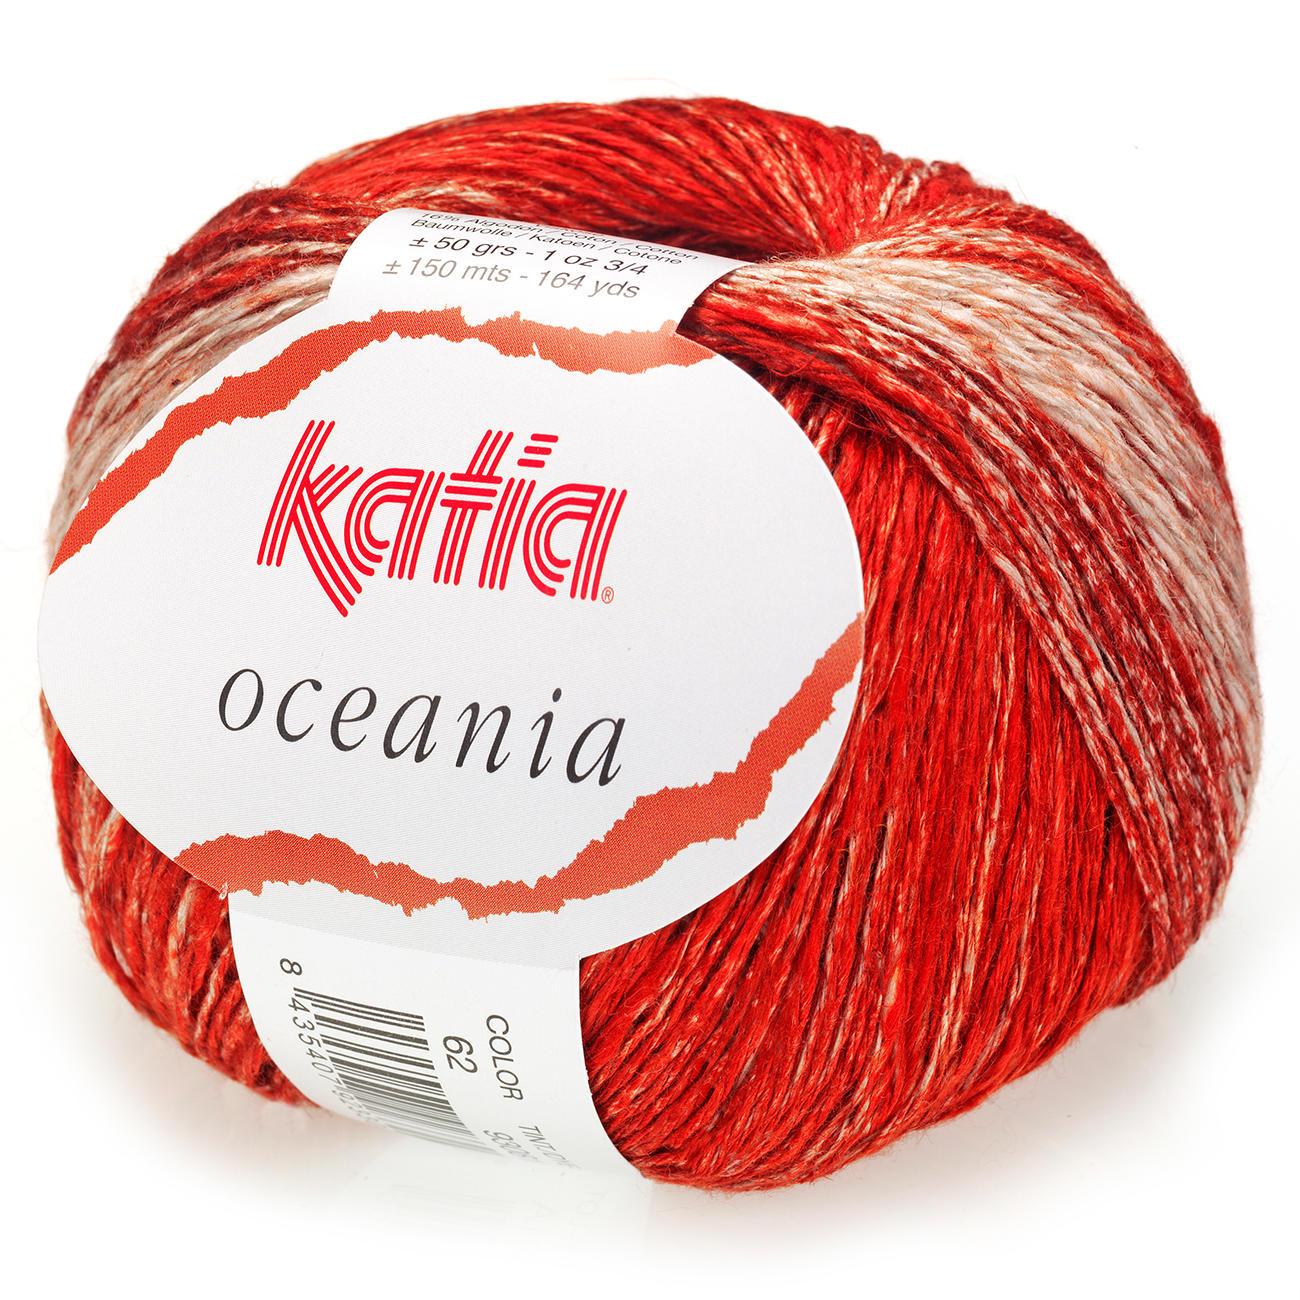 50g Garn- Wolle OCEANIA katia